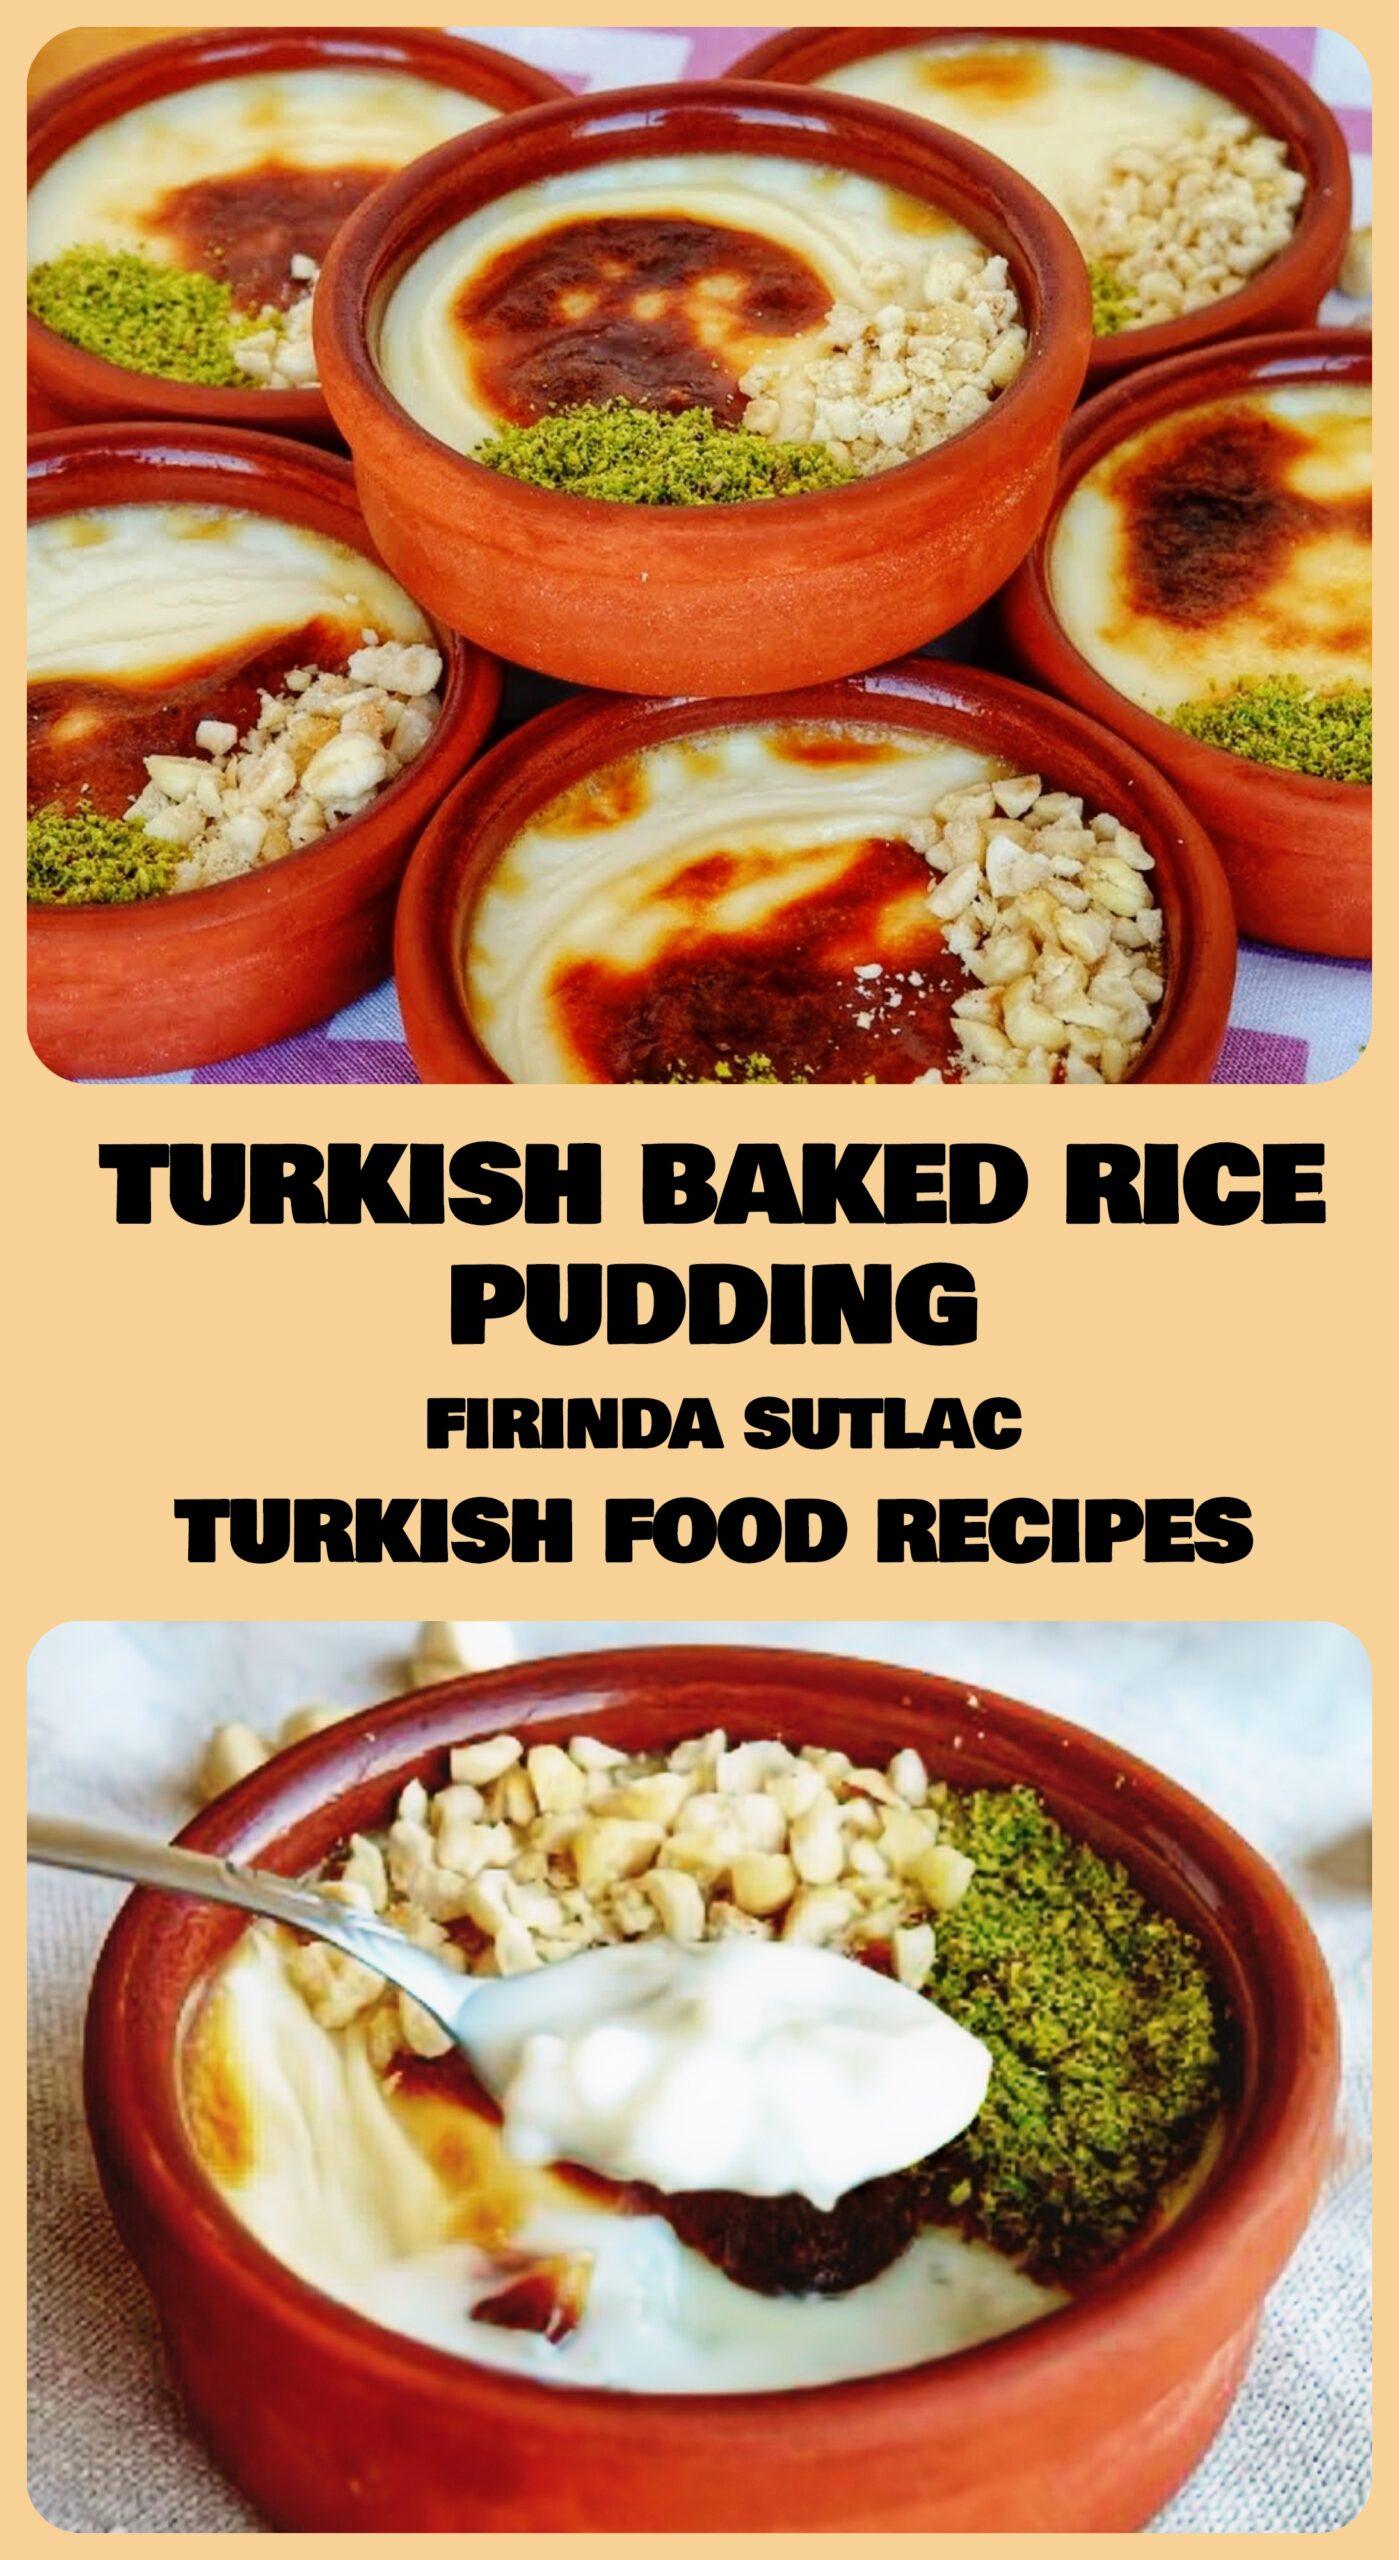 Turkish Baked Rice Pudding - Firinda Sutlac Recipe